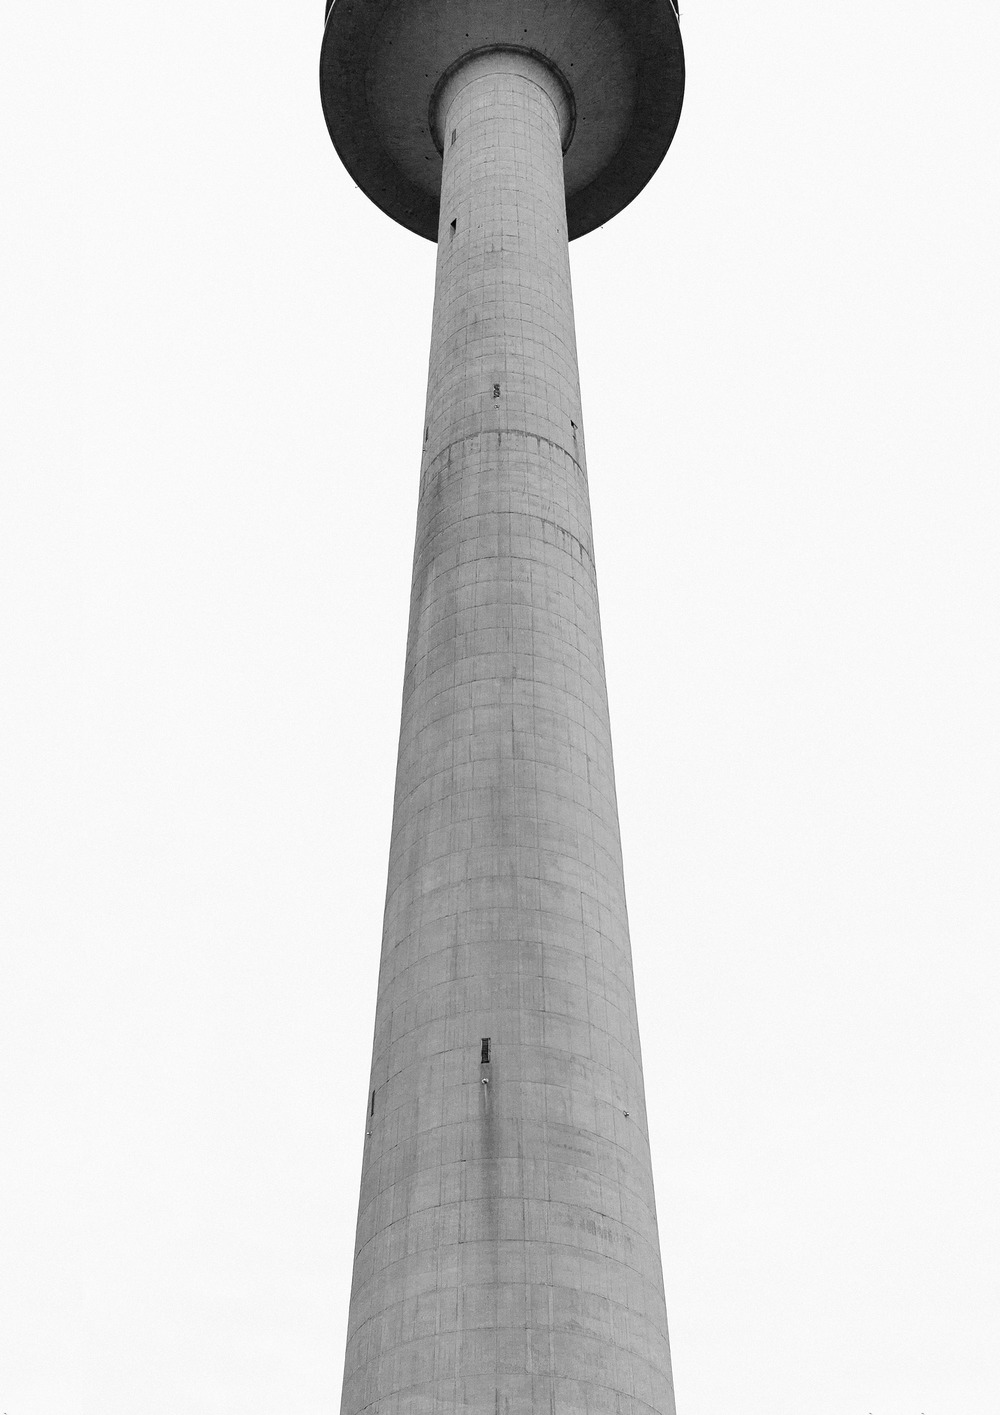 olympia tower I